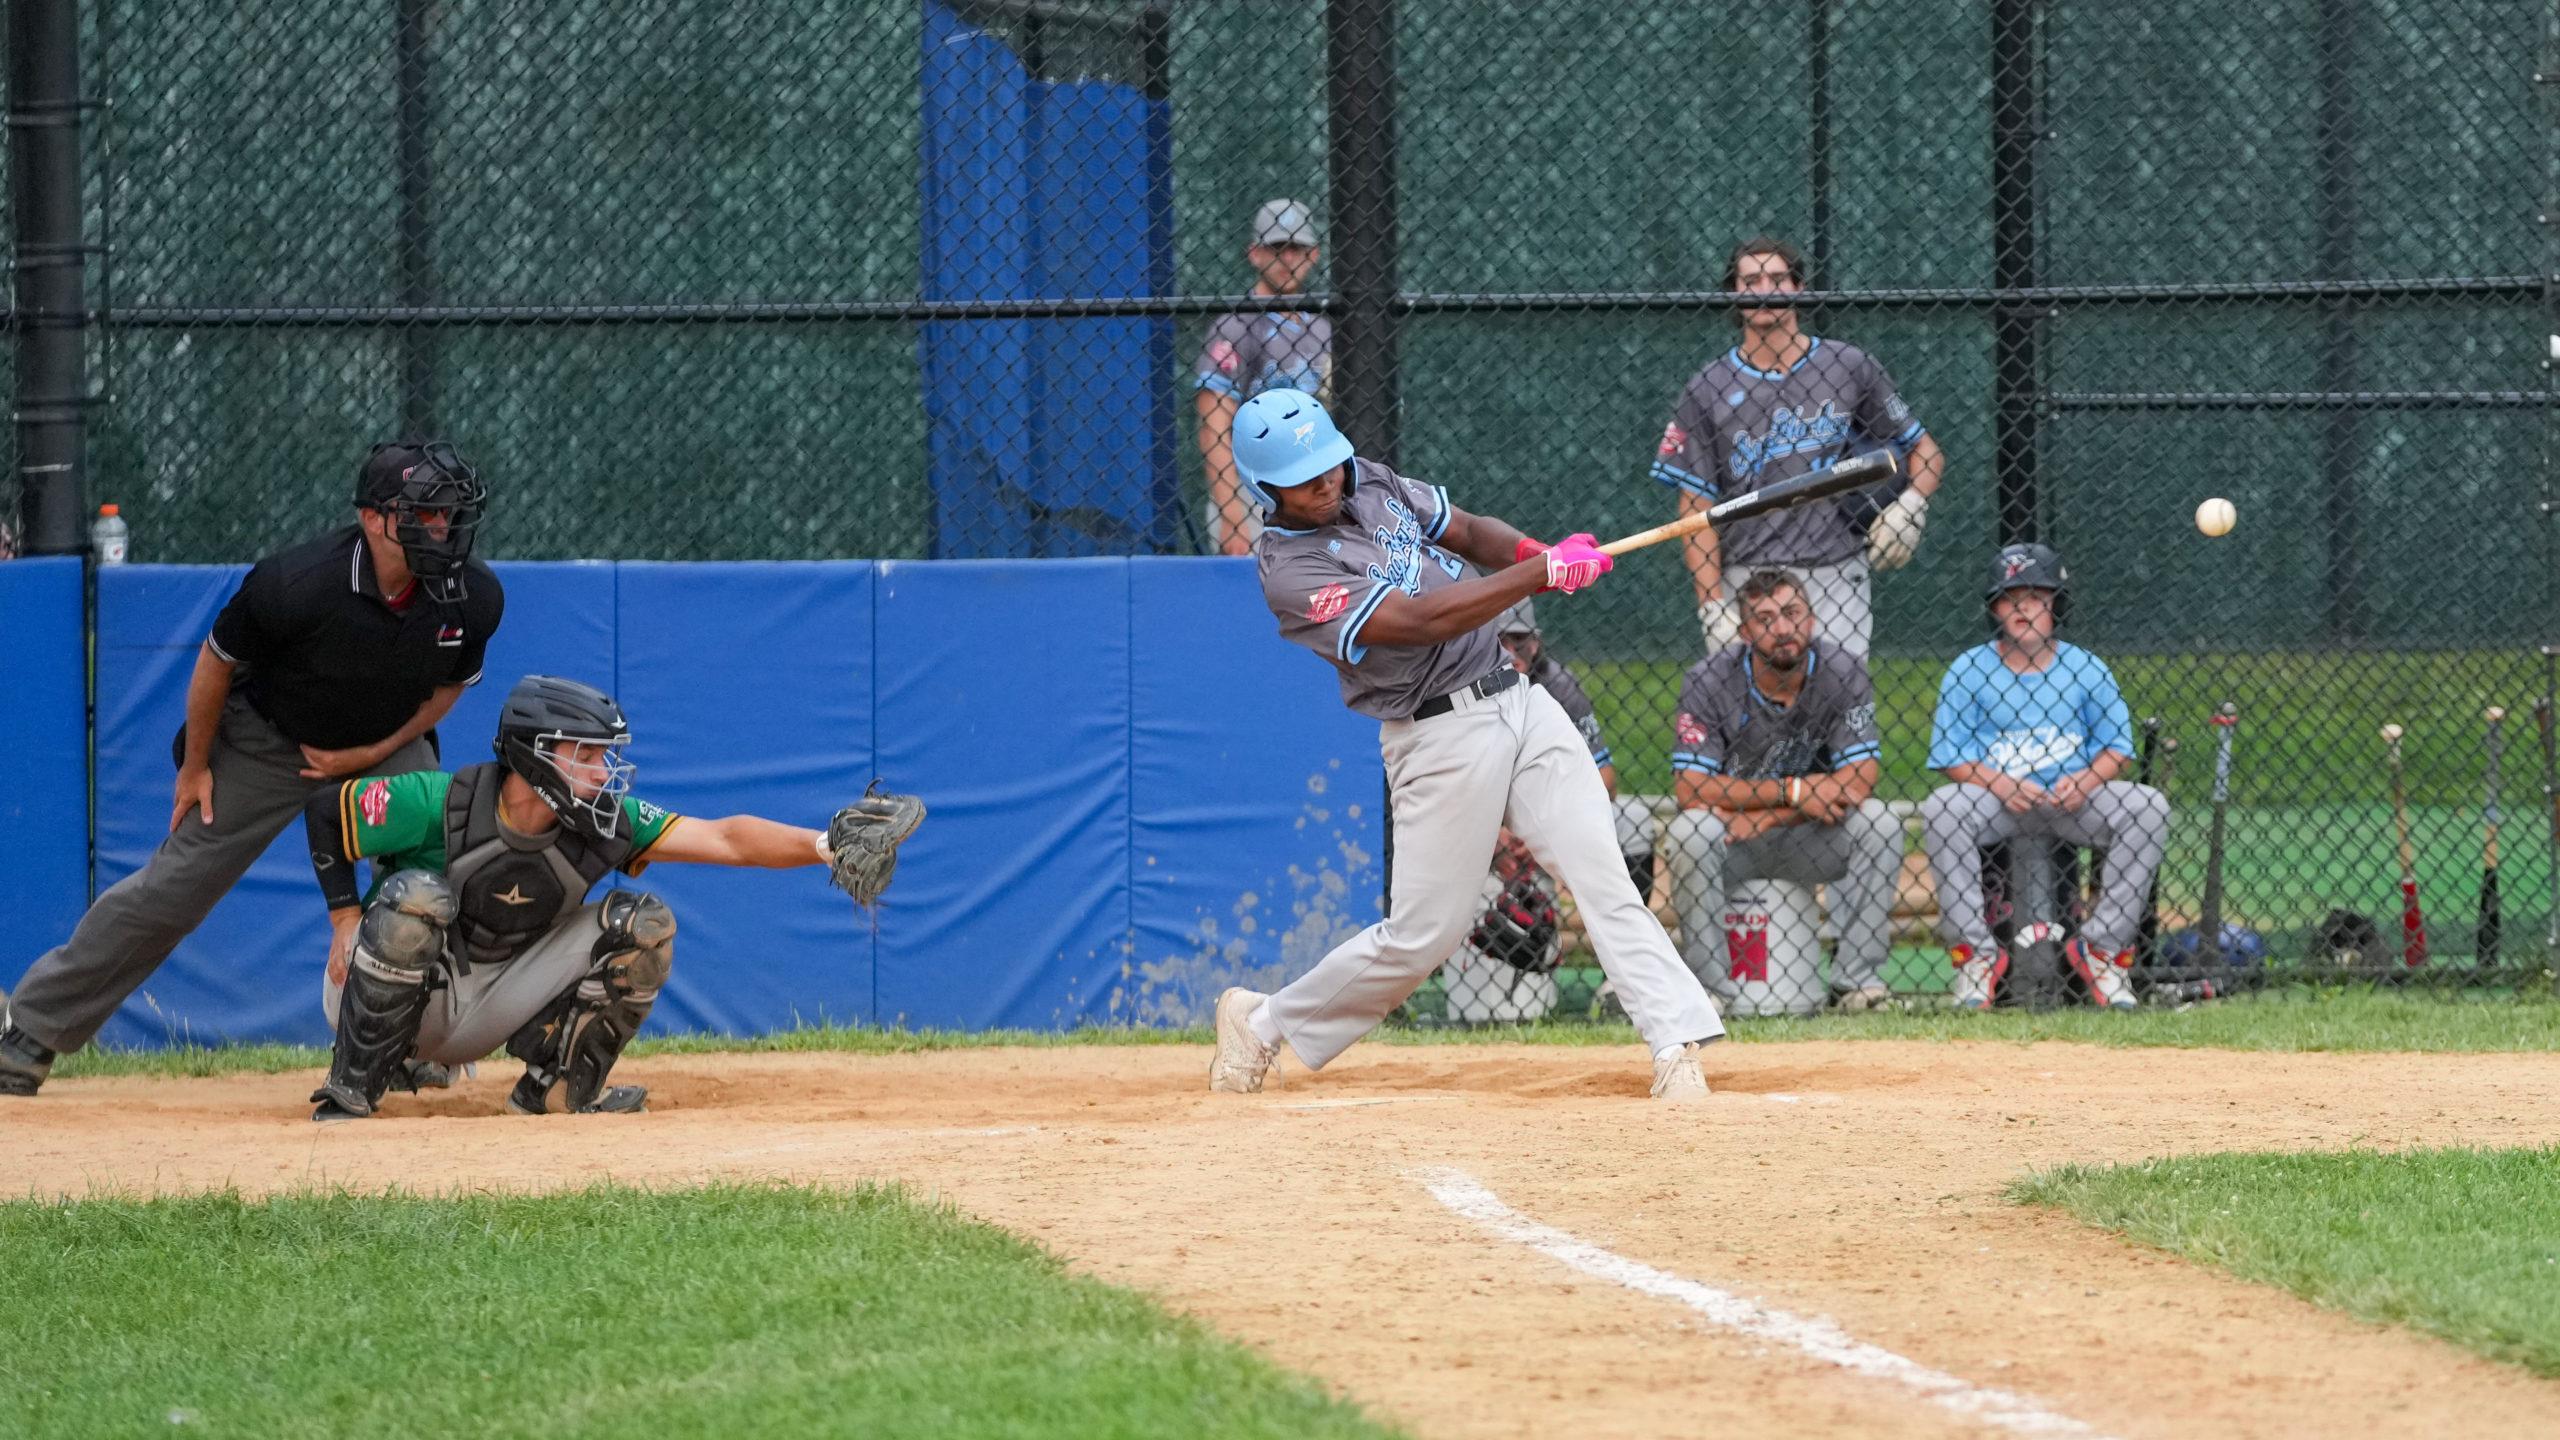 Myles Proctor (LIU) singles to center field to drive in the eventual game-winning run.